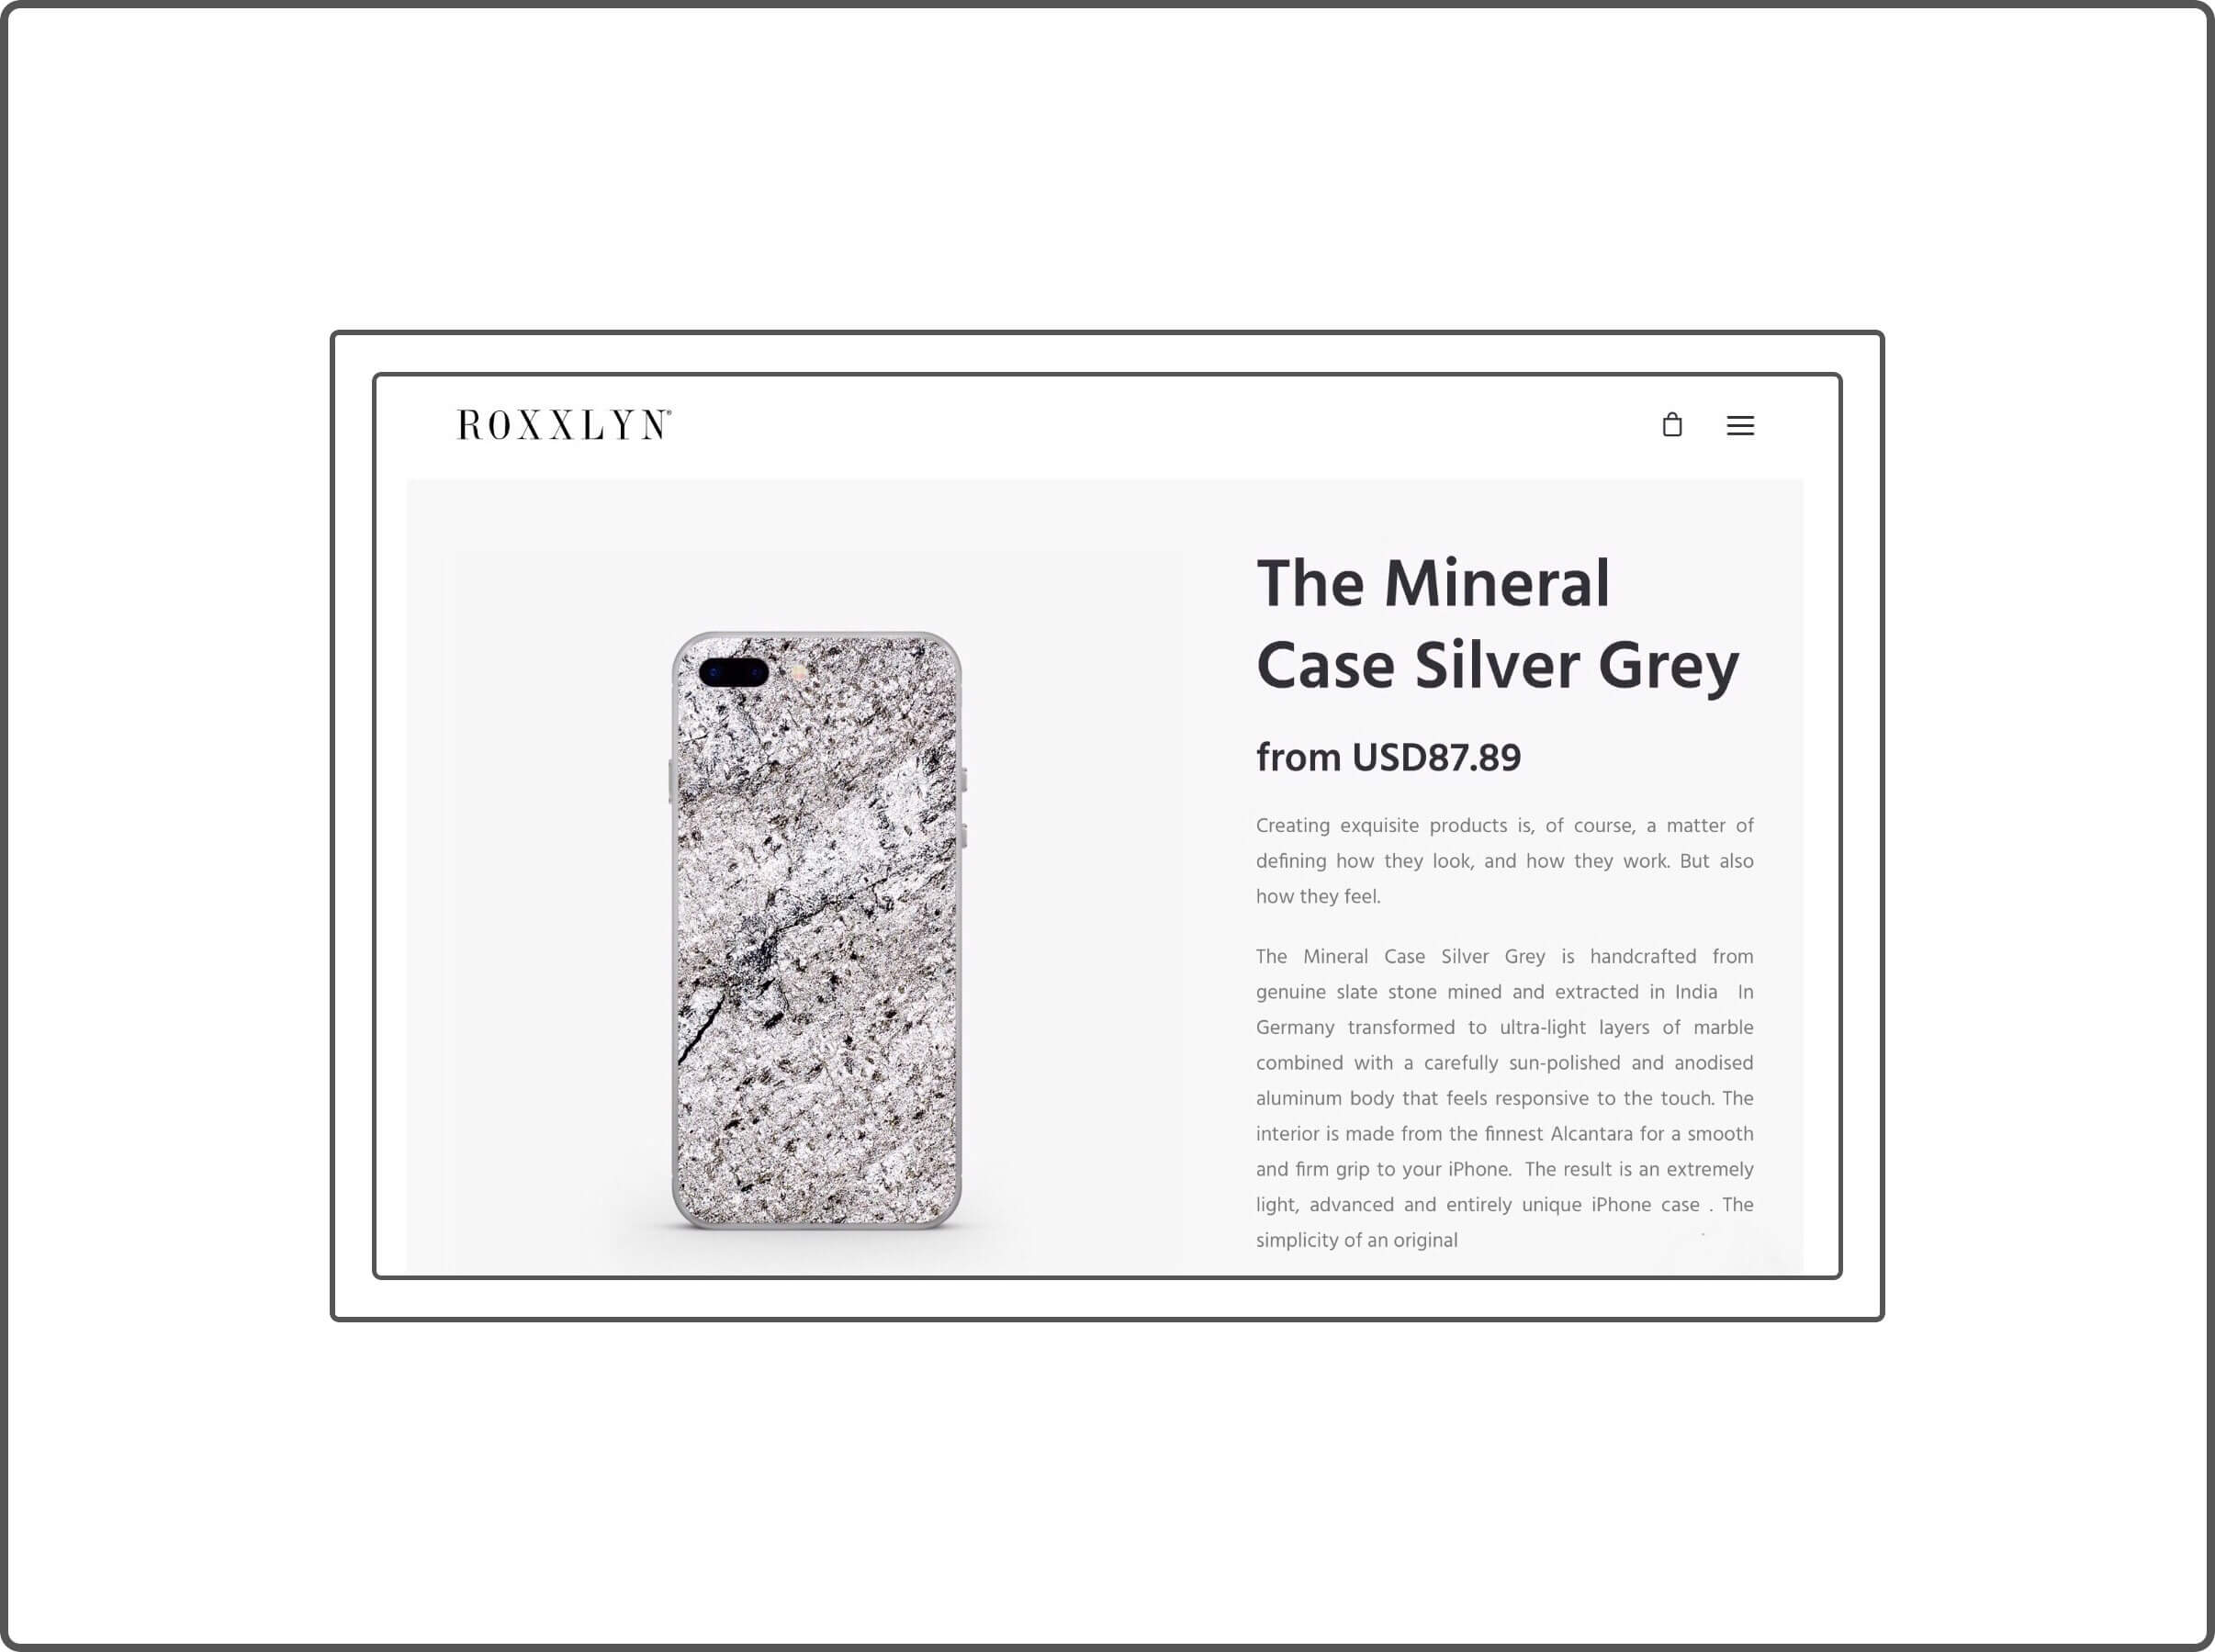 Roxxlyn's silver Grey Mineral Case